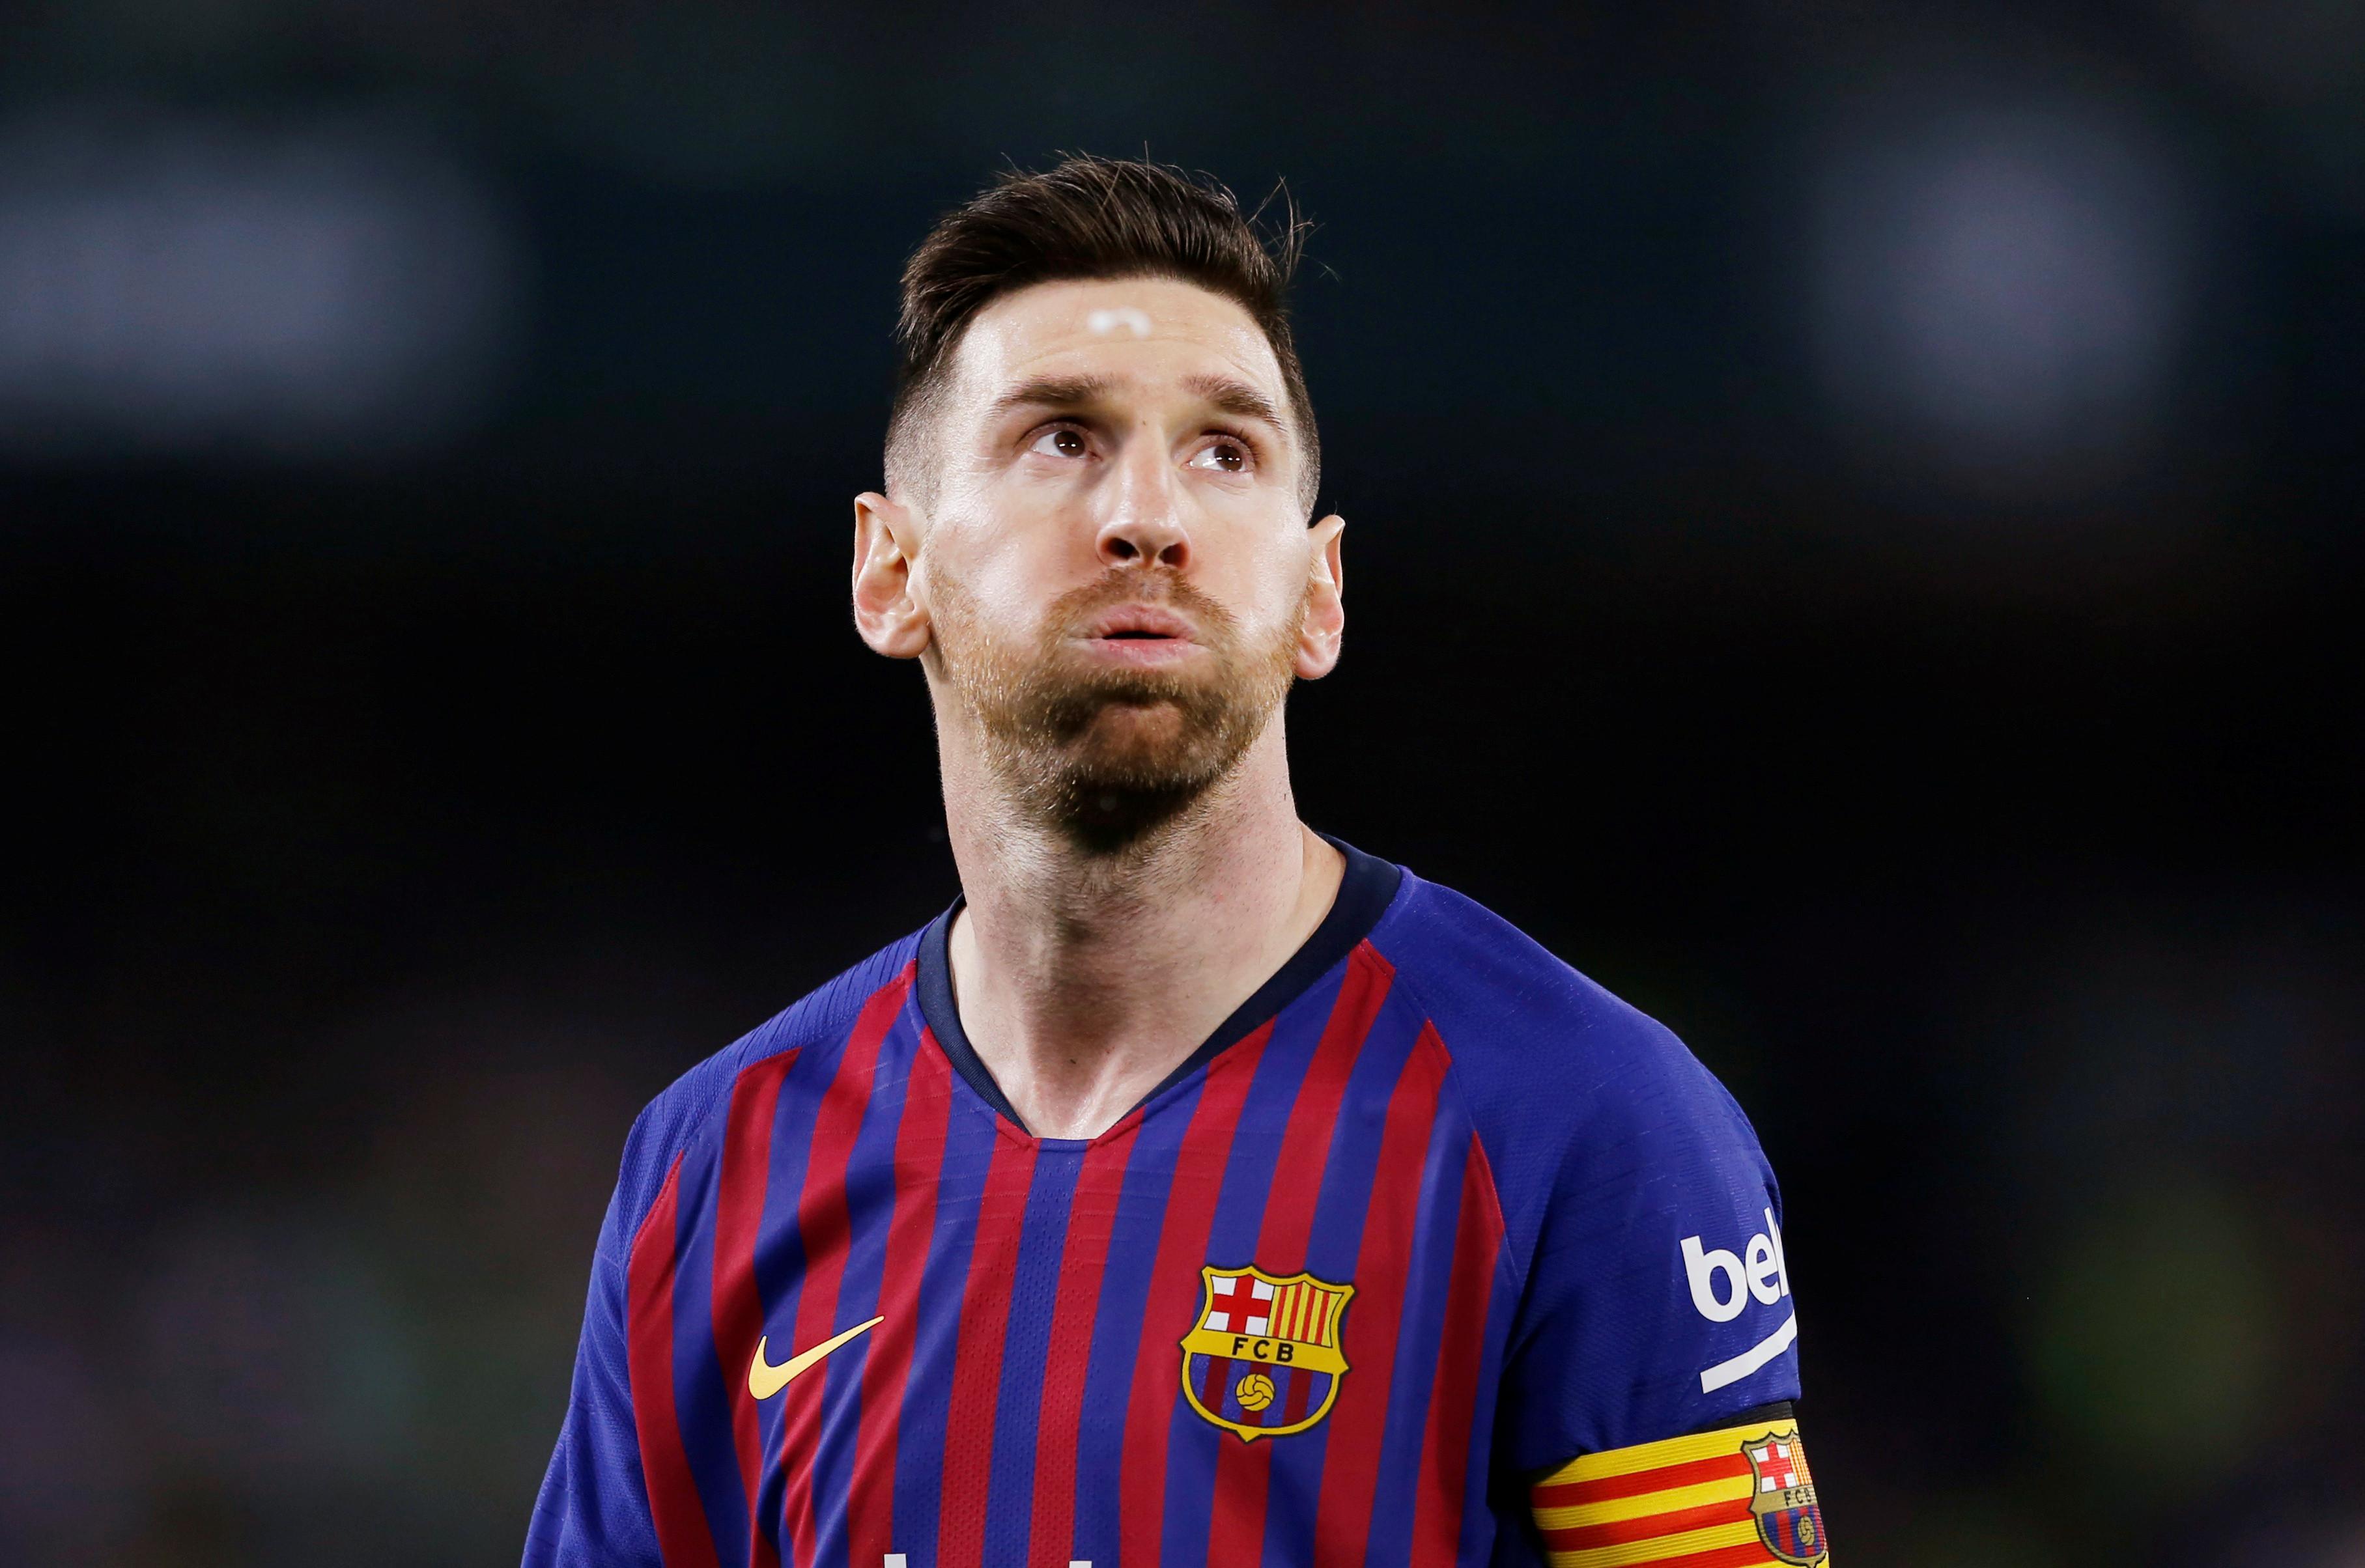 Messi vestiu a pele de 'monstro' e Benito Villamarín aplaudiu-o de pé